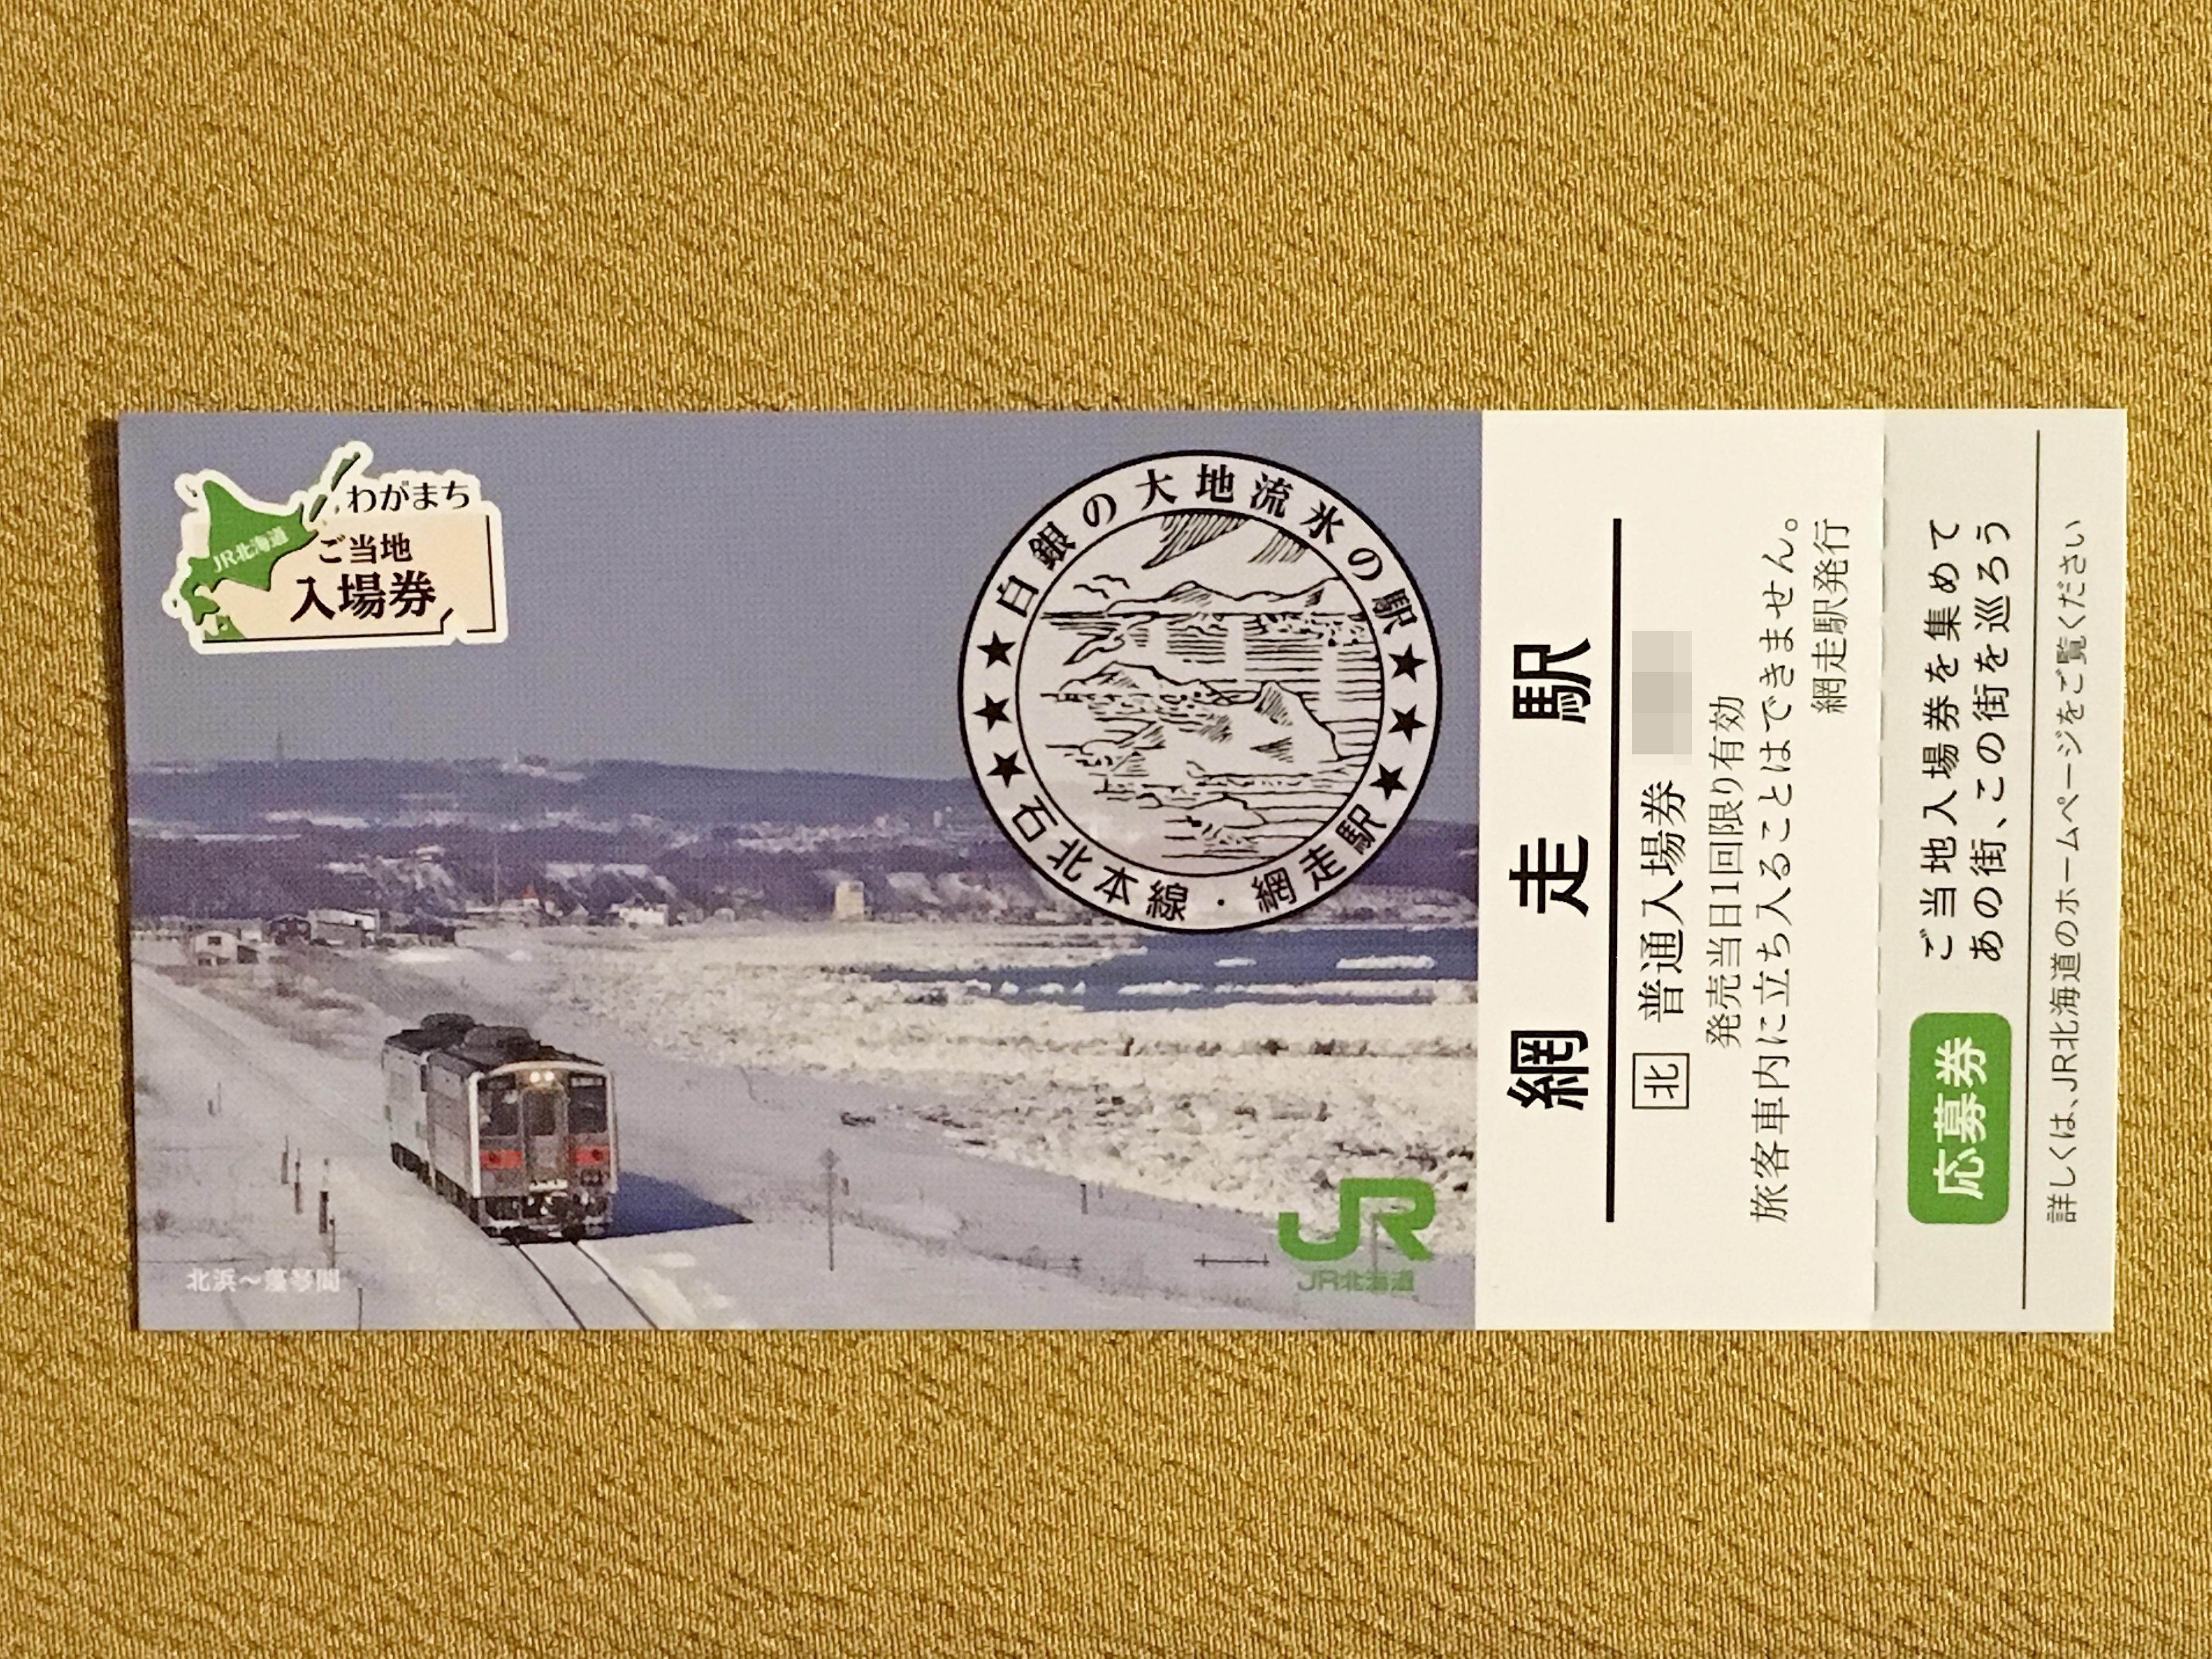 JR北海道ご当地入場券  網走駅表.JPG